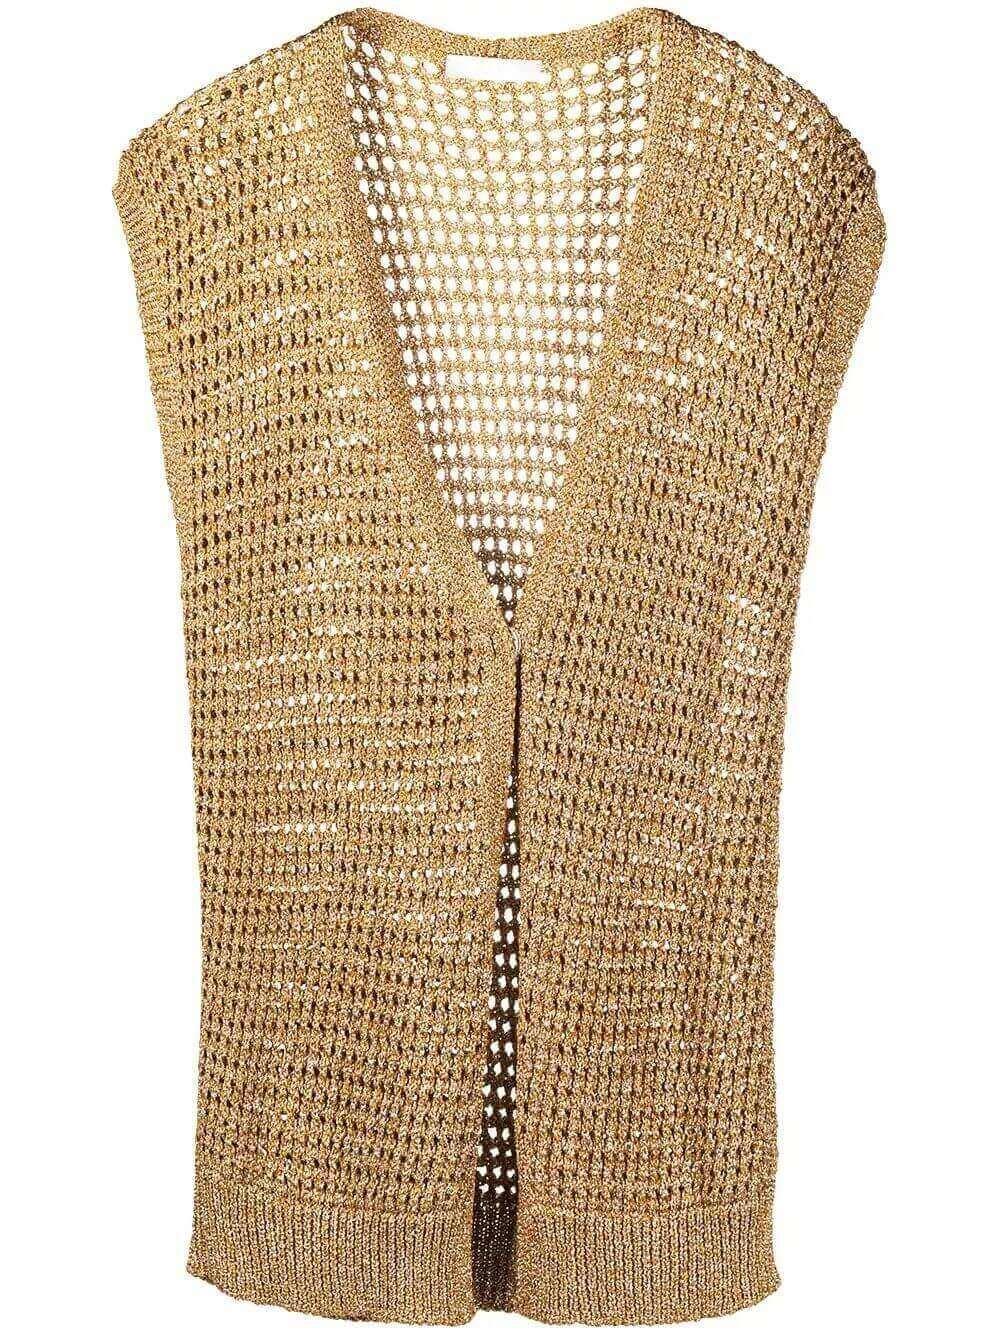 Lurex Open- Knit Vest Item # MAD271W096